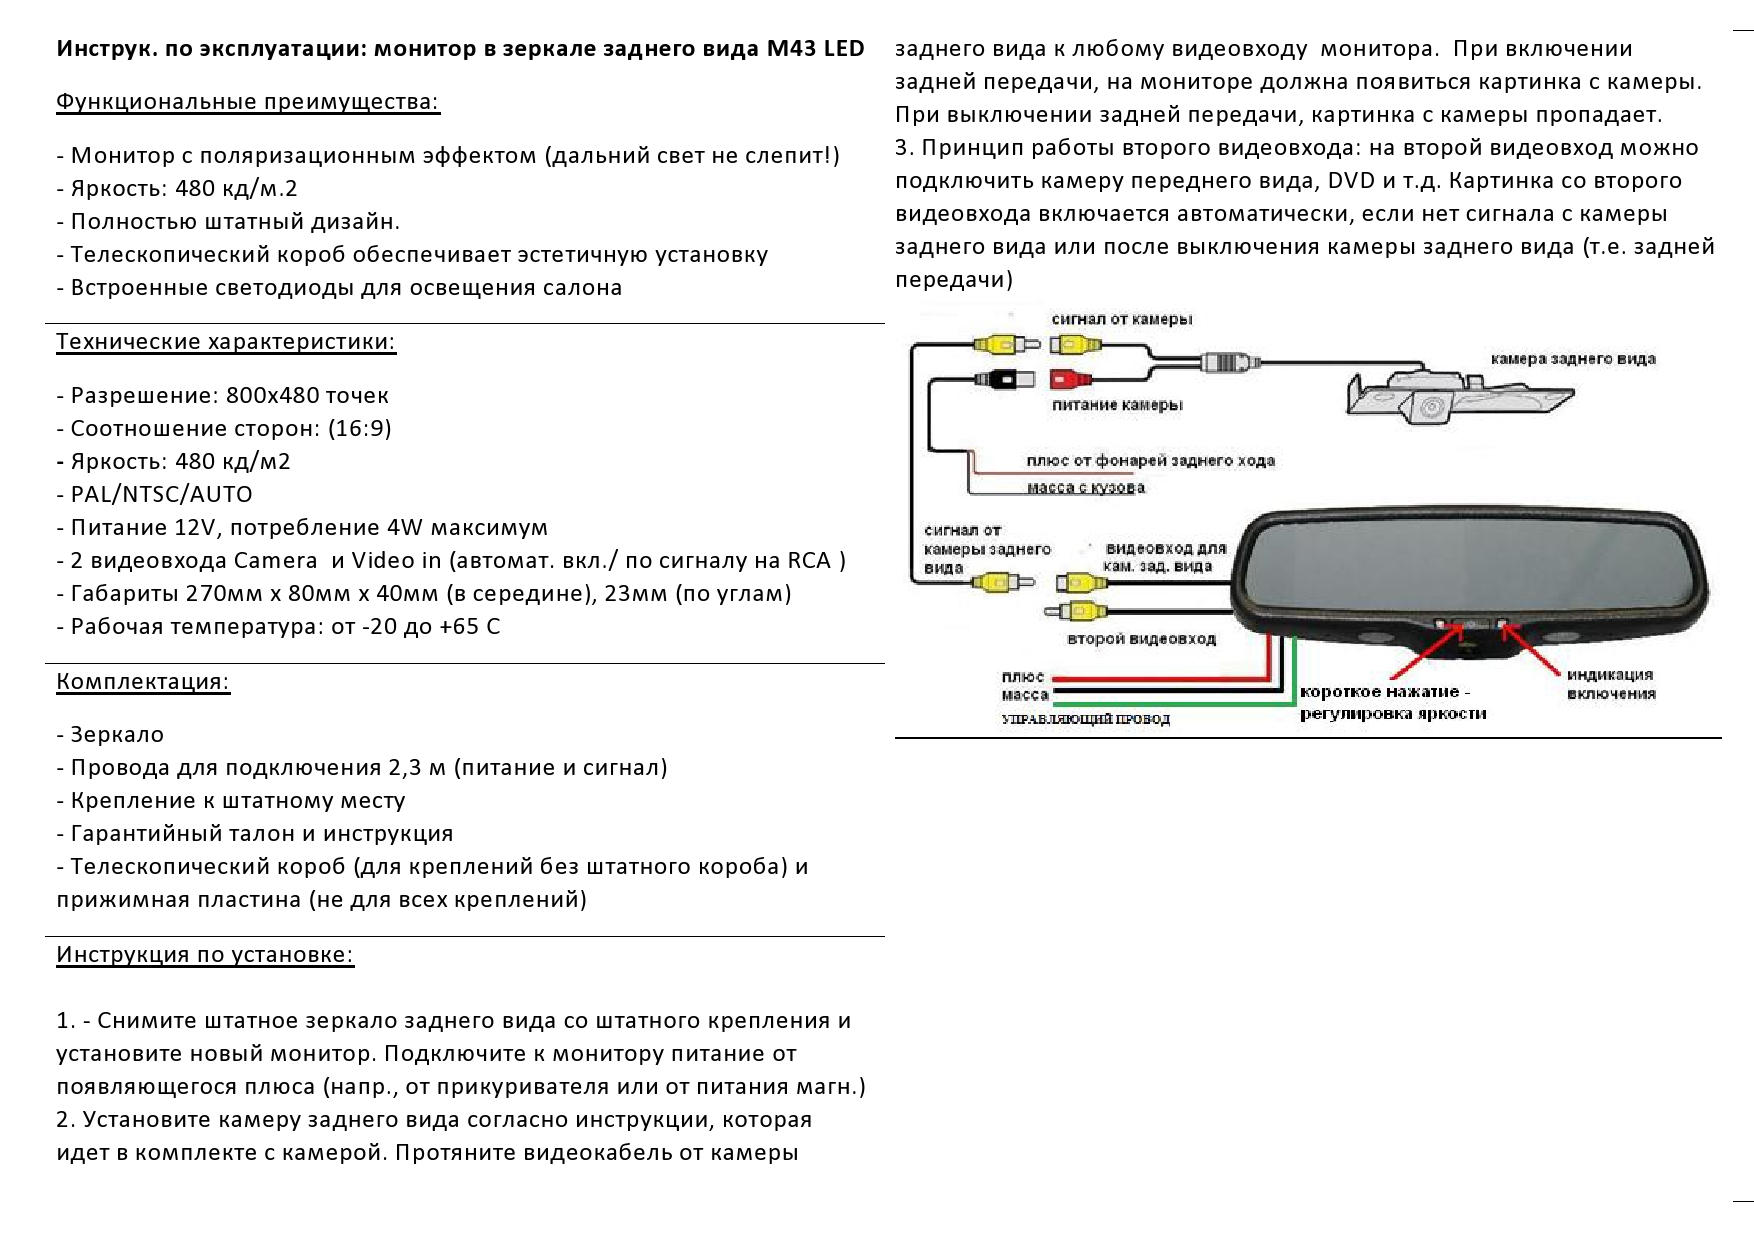 Схема подключения зеркало с монитором заднего вида и камеру заднего вида